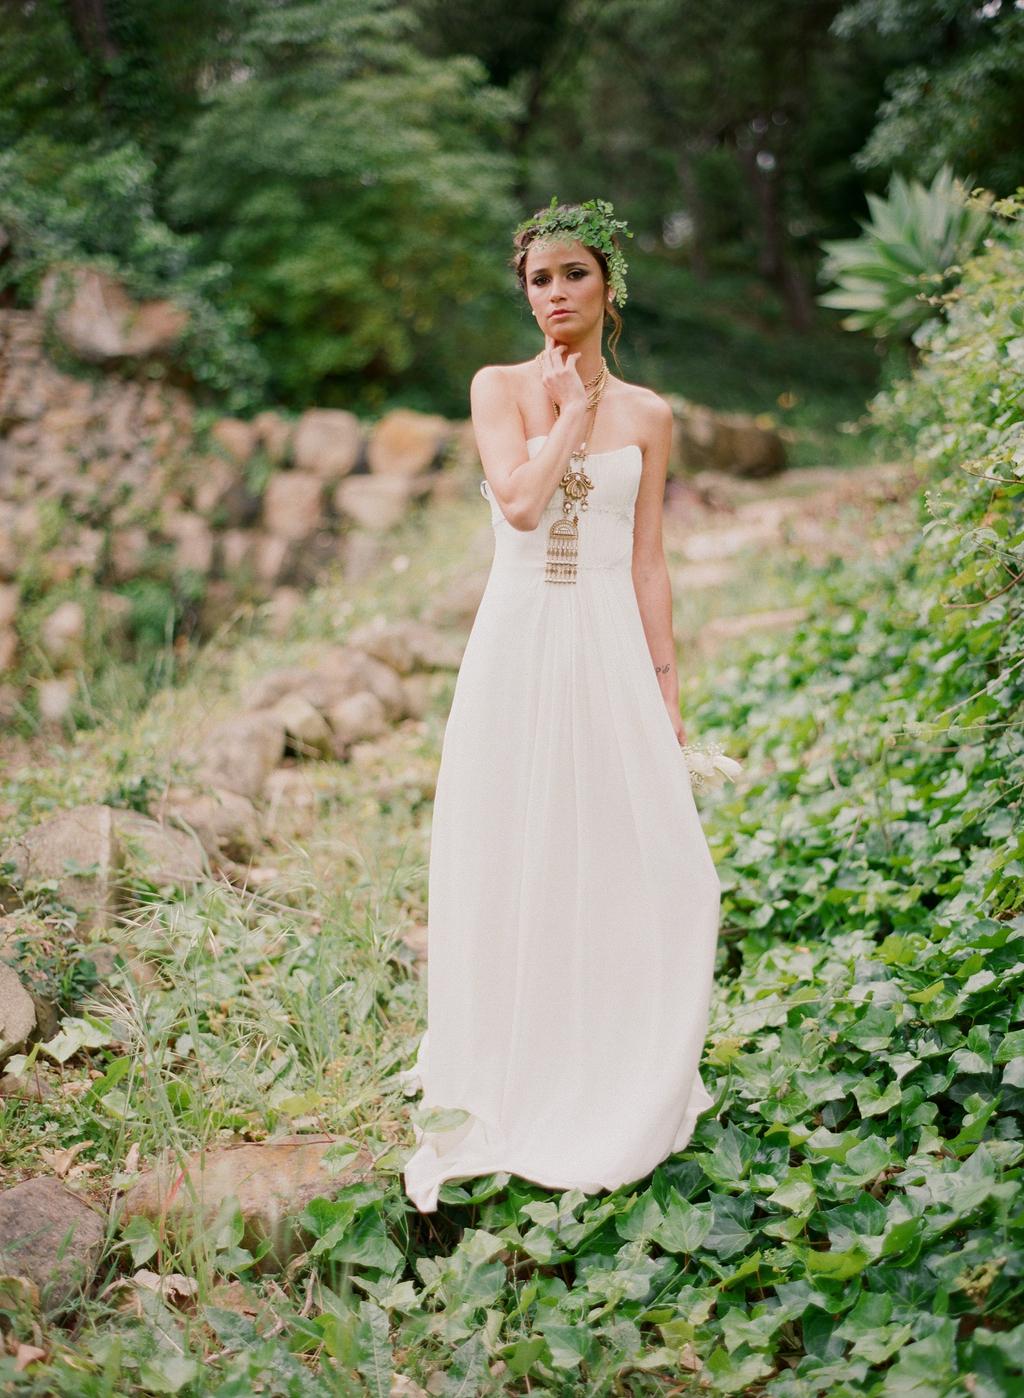 Styled-wedding-santa-barbara-chic-beaux-arts-phtographie-italian-bohemian-wedding-bride-wedding-dress-108.full